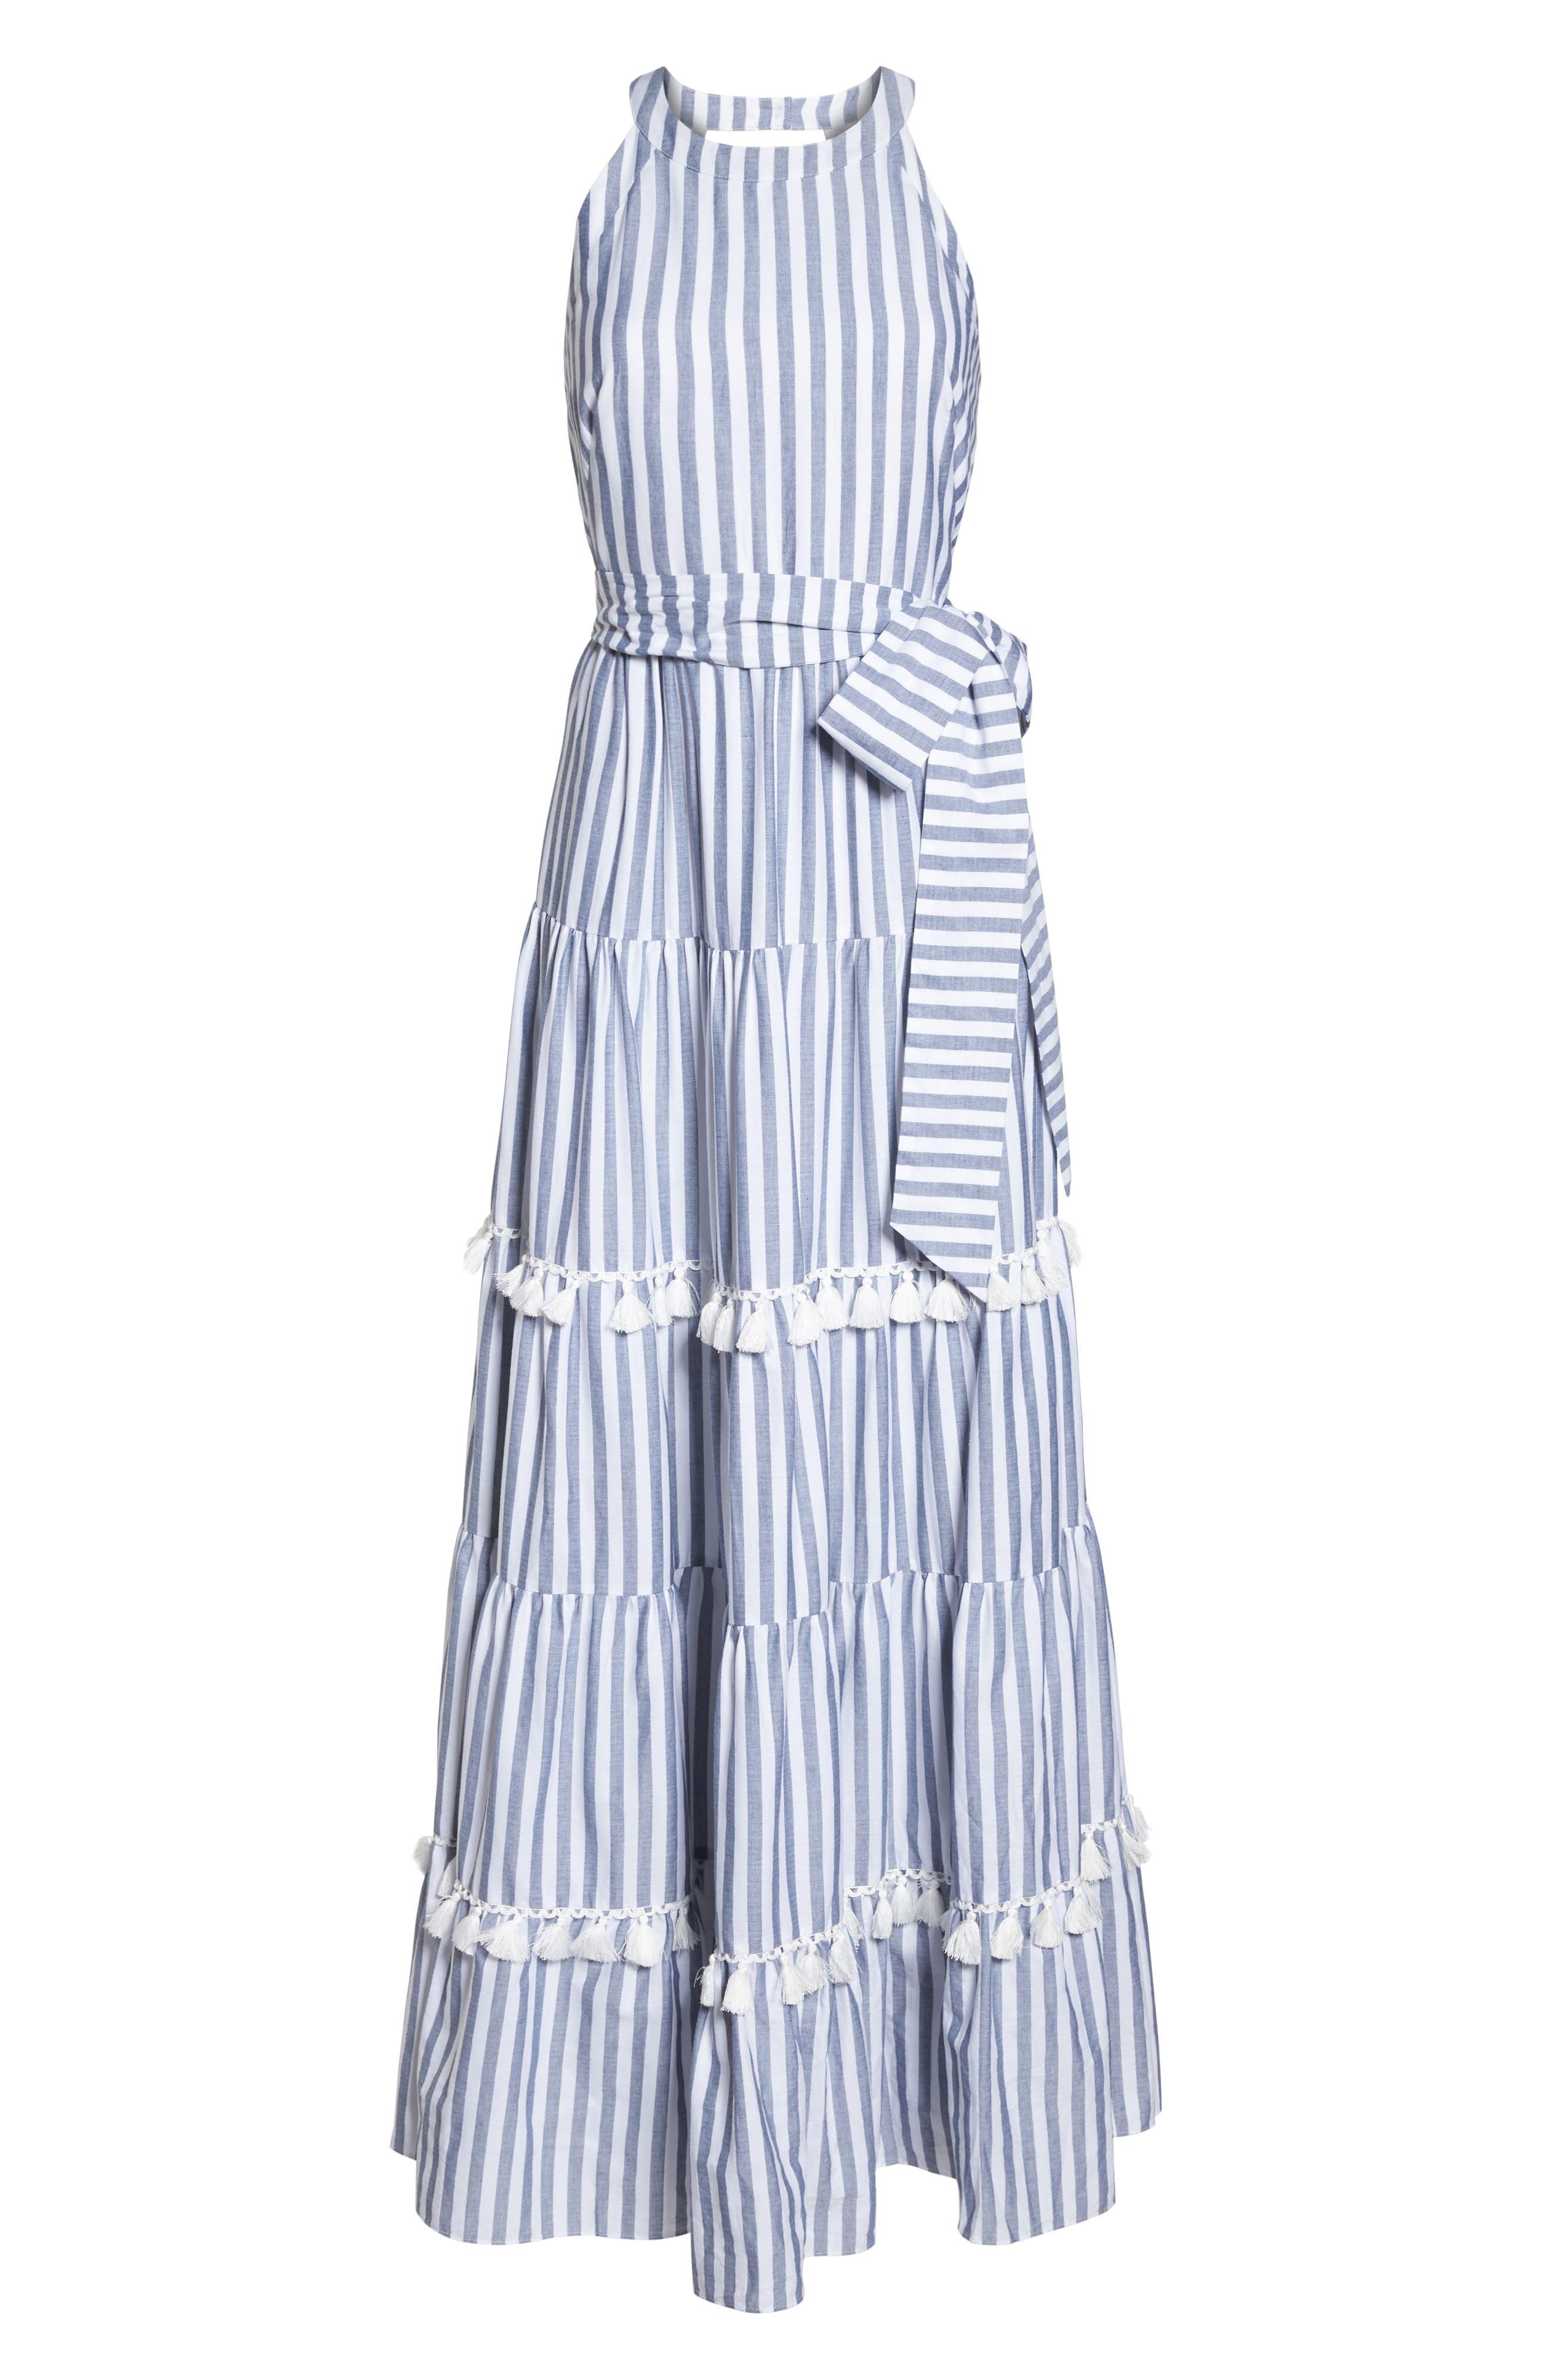 ELIZA J,                             Tiered Tassel Fringe Cotton Maxi Dress,                             Alternate thumbnail 7, color,                             IVORY/ GREY